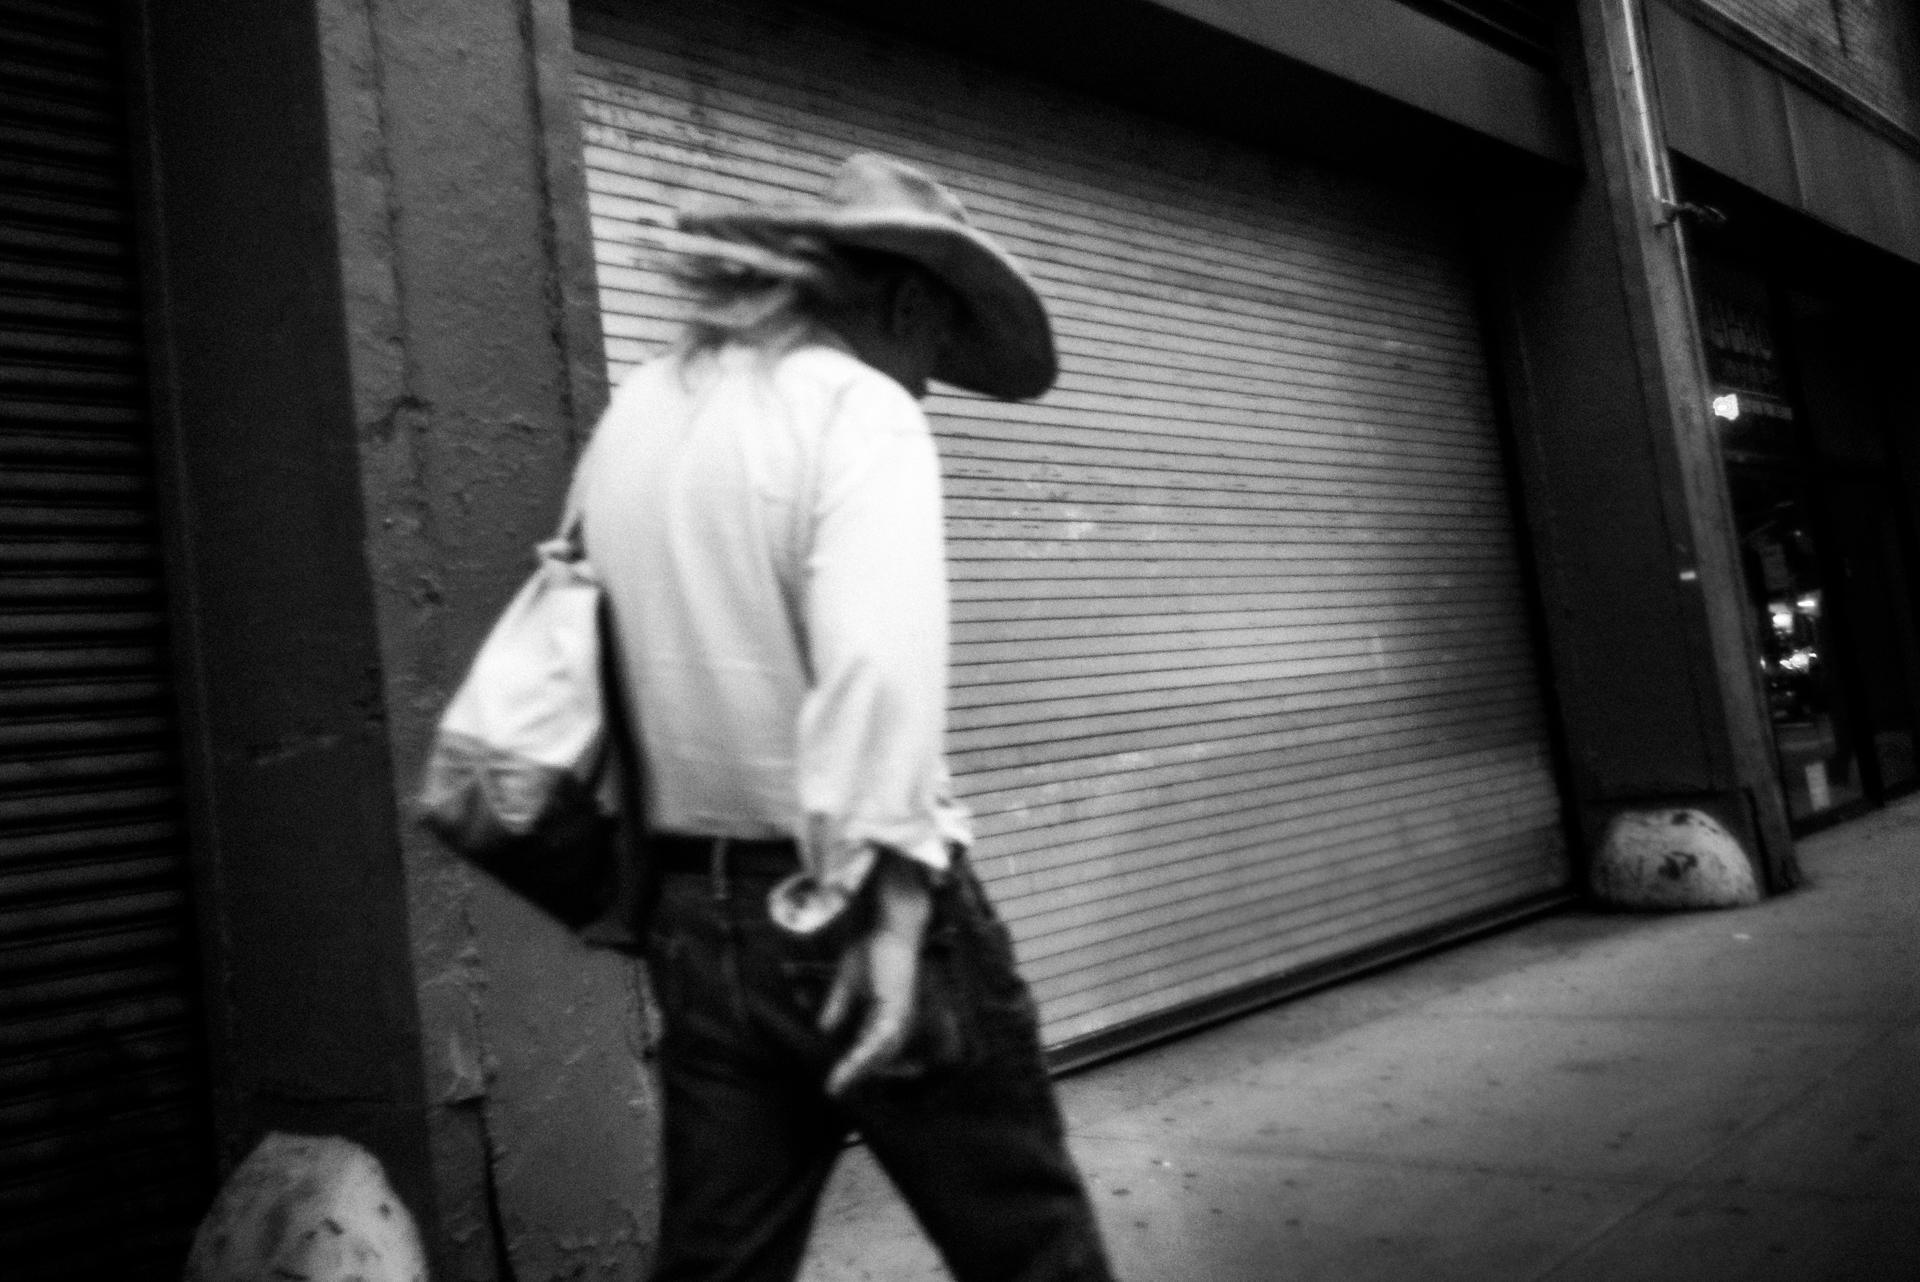 'Untitled' Cowboy Studies - Noir Black & White Photography